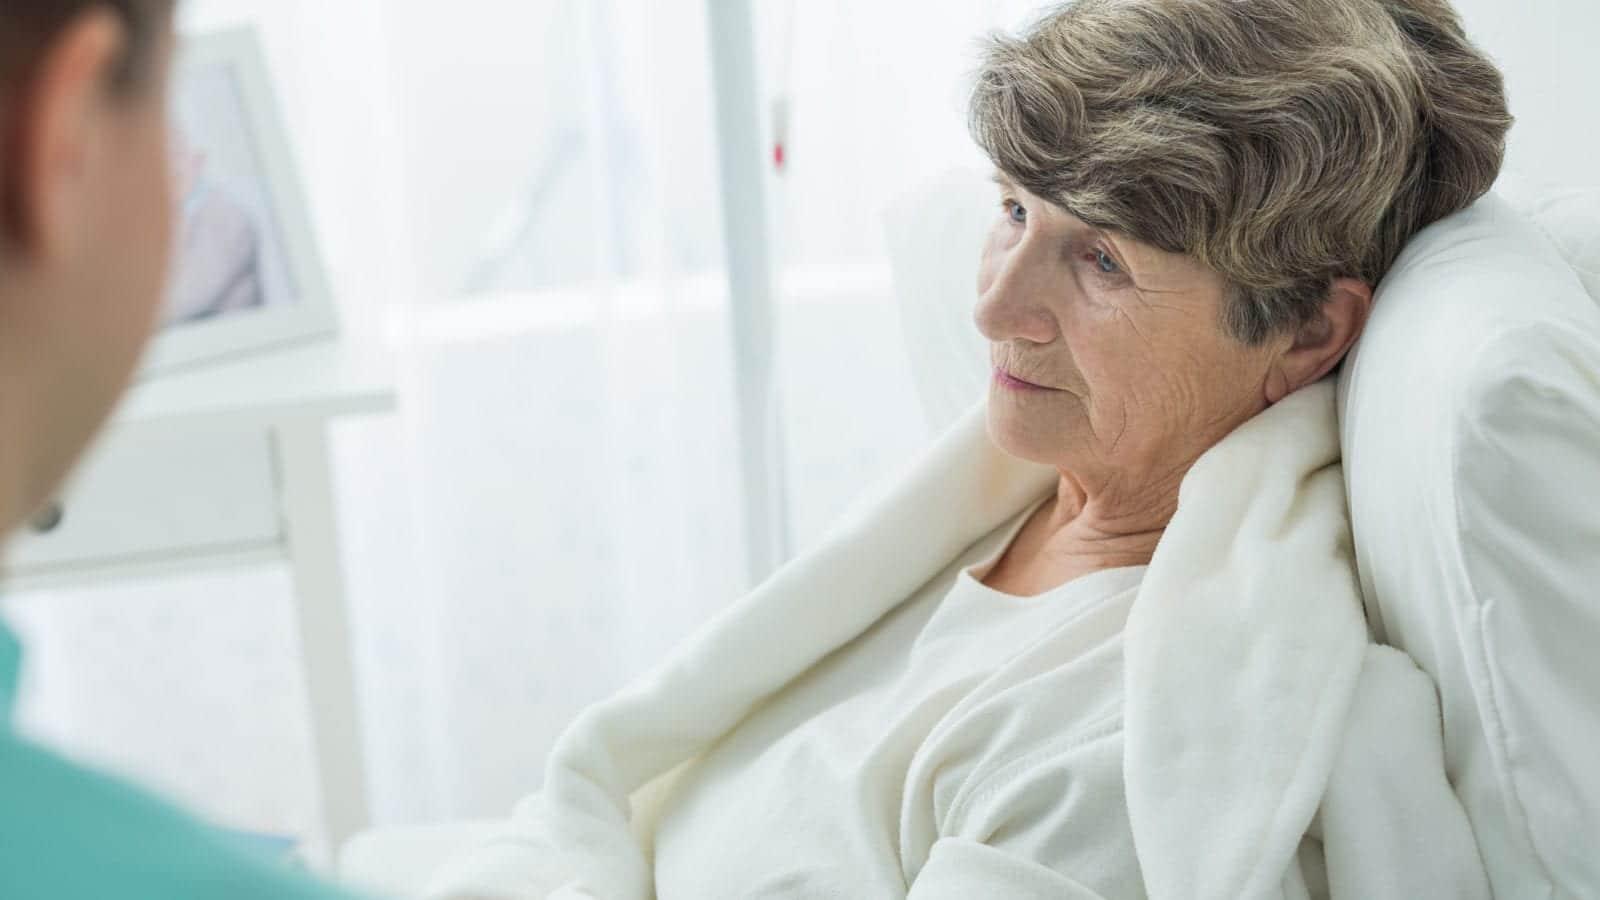 Photo of nurse and sad old woman at hospital